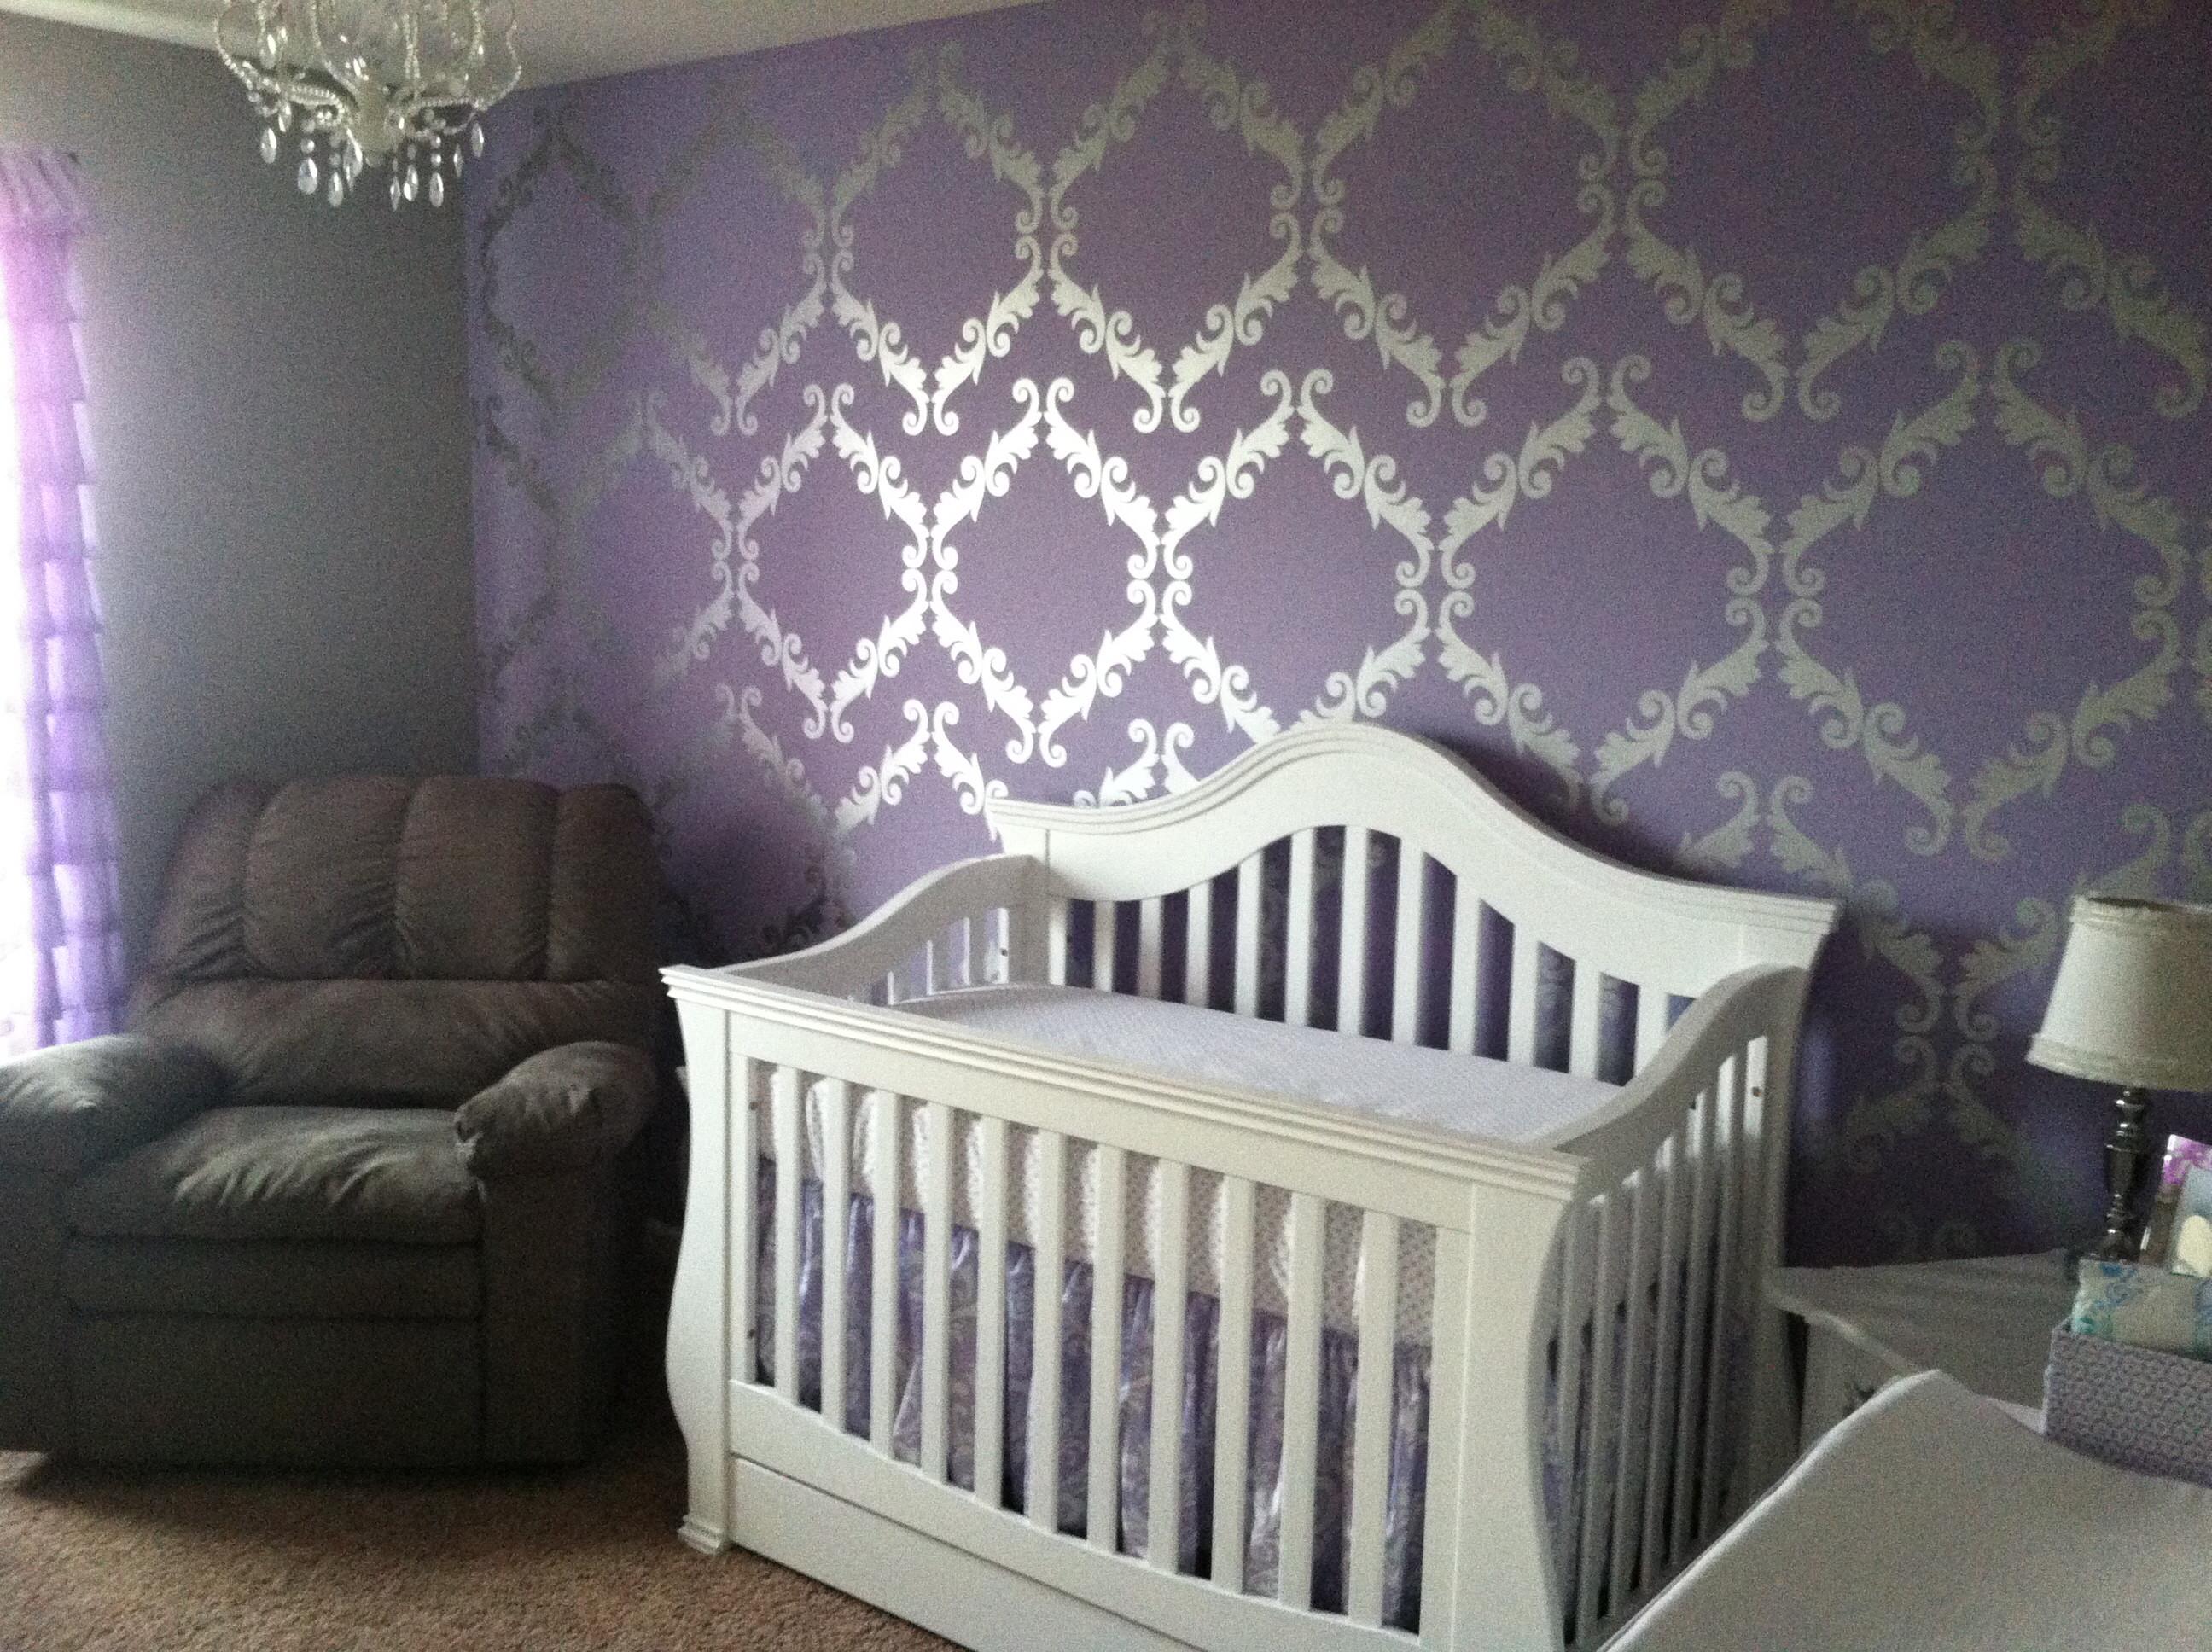 Purple, metallic silver and white baby girl's nursery